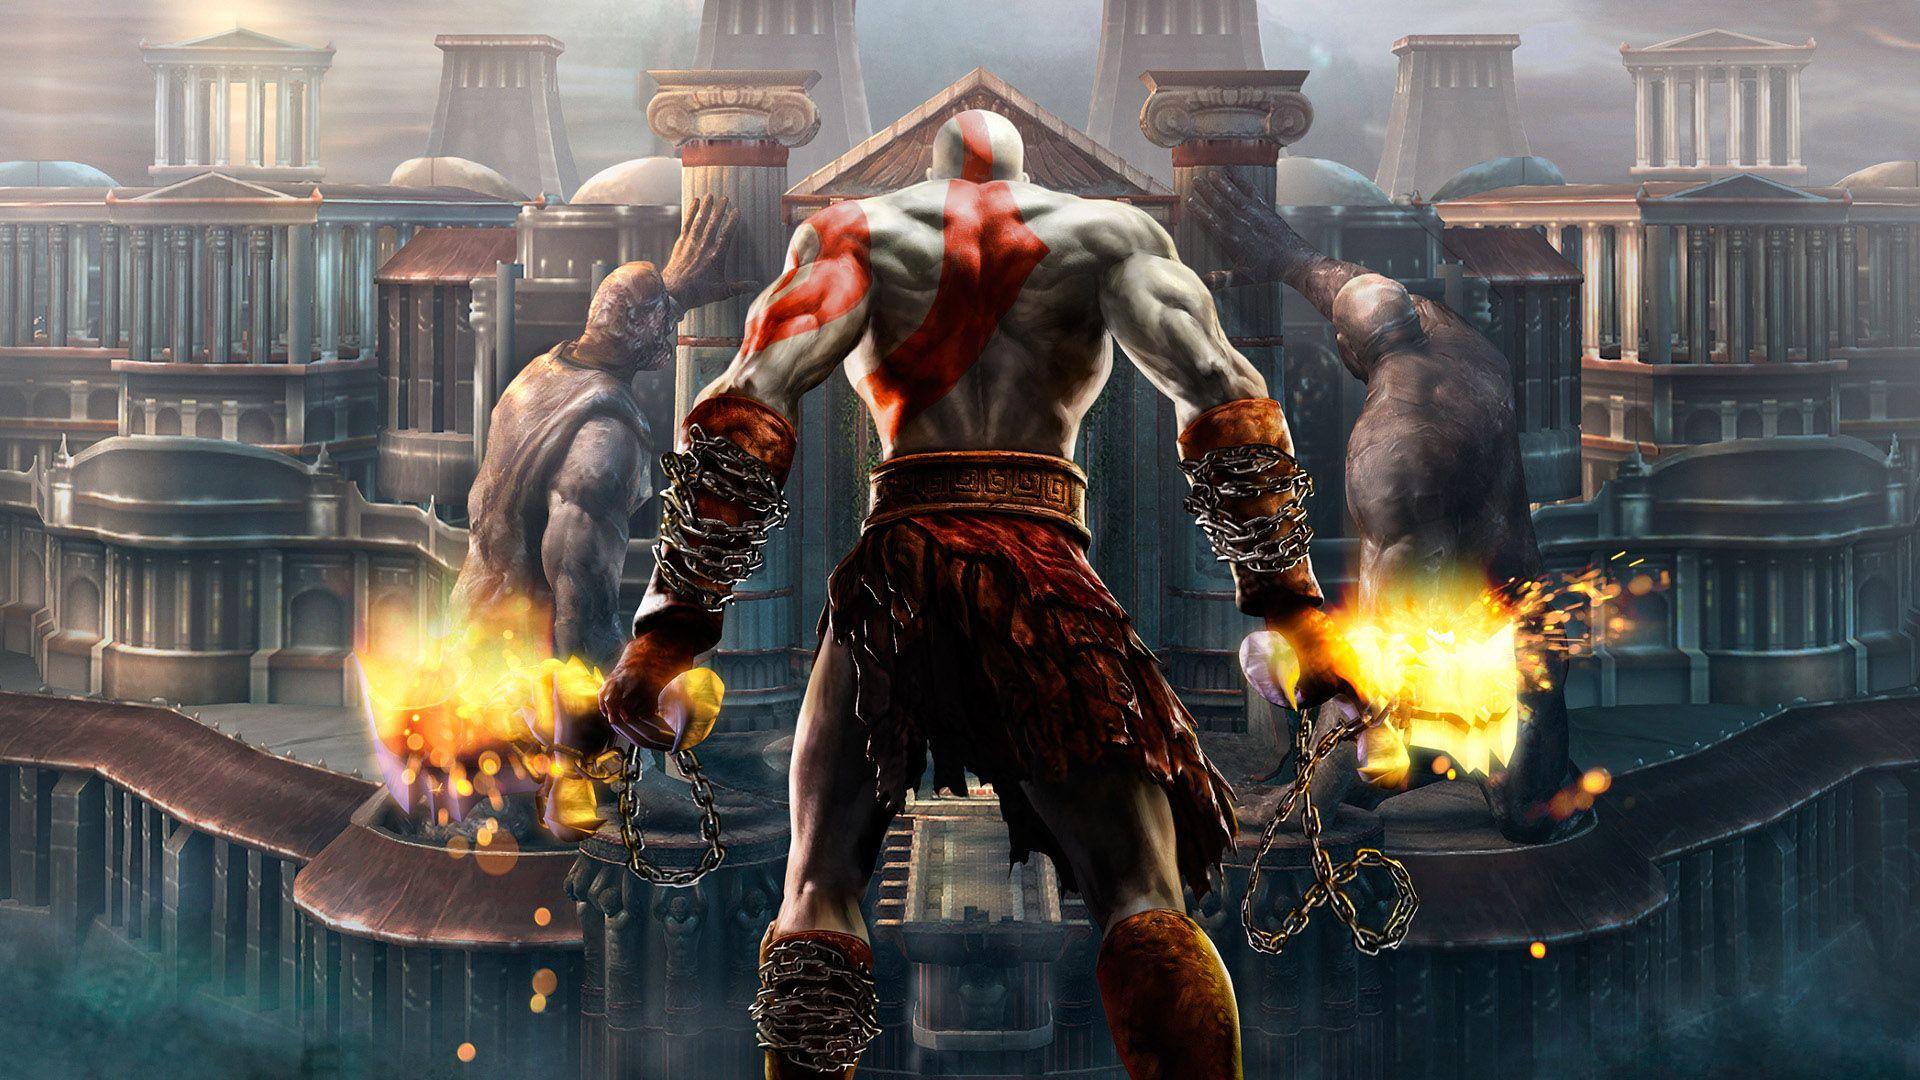 God Of War Wallpaper 1920x1080 Kratos God Of War God Of War Wallpaper God Of War 4